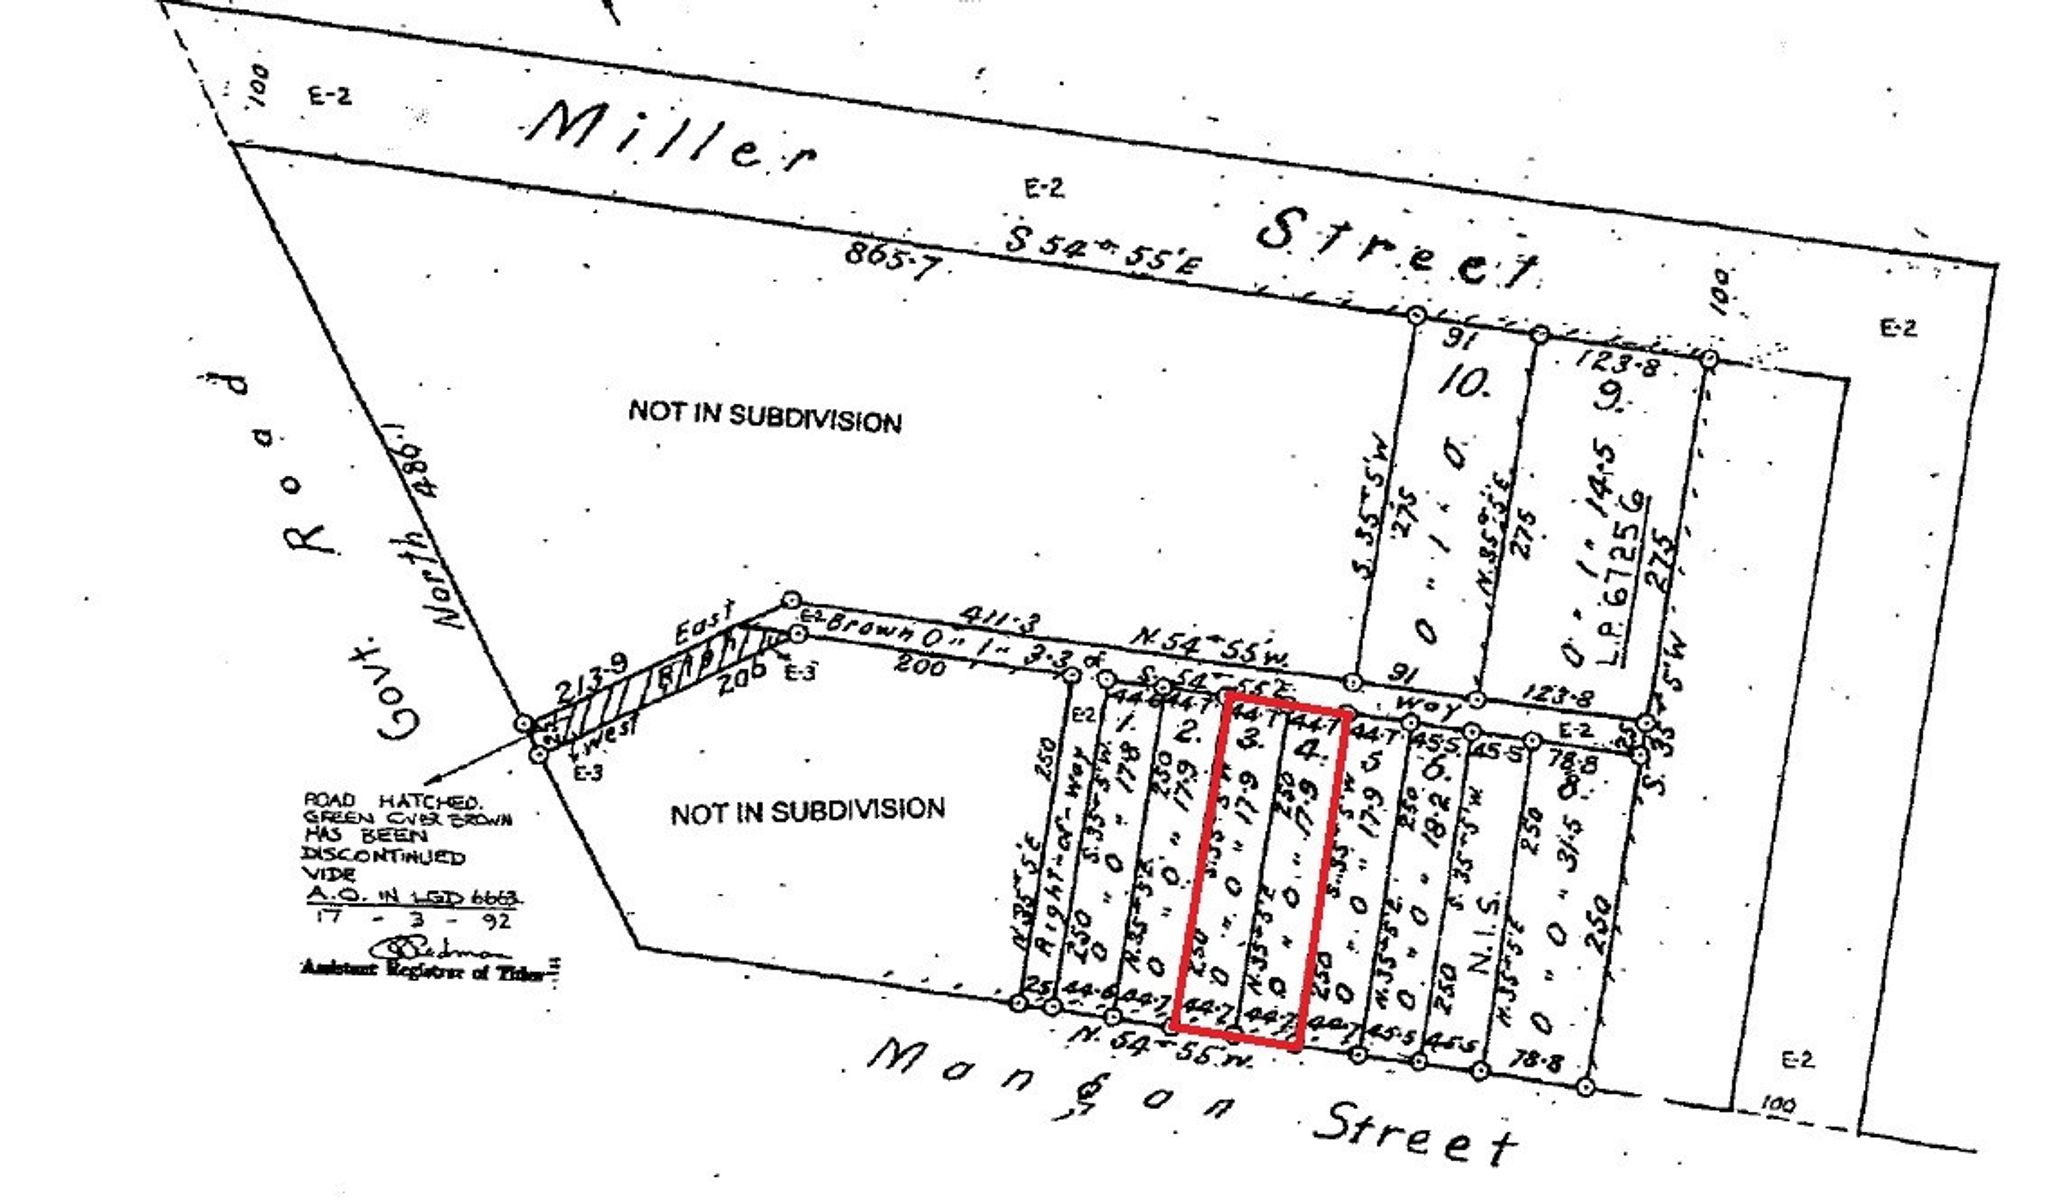 110-112 Mangan Street, Tongala, VIC 3621